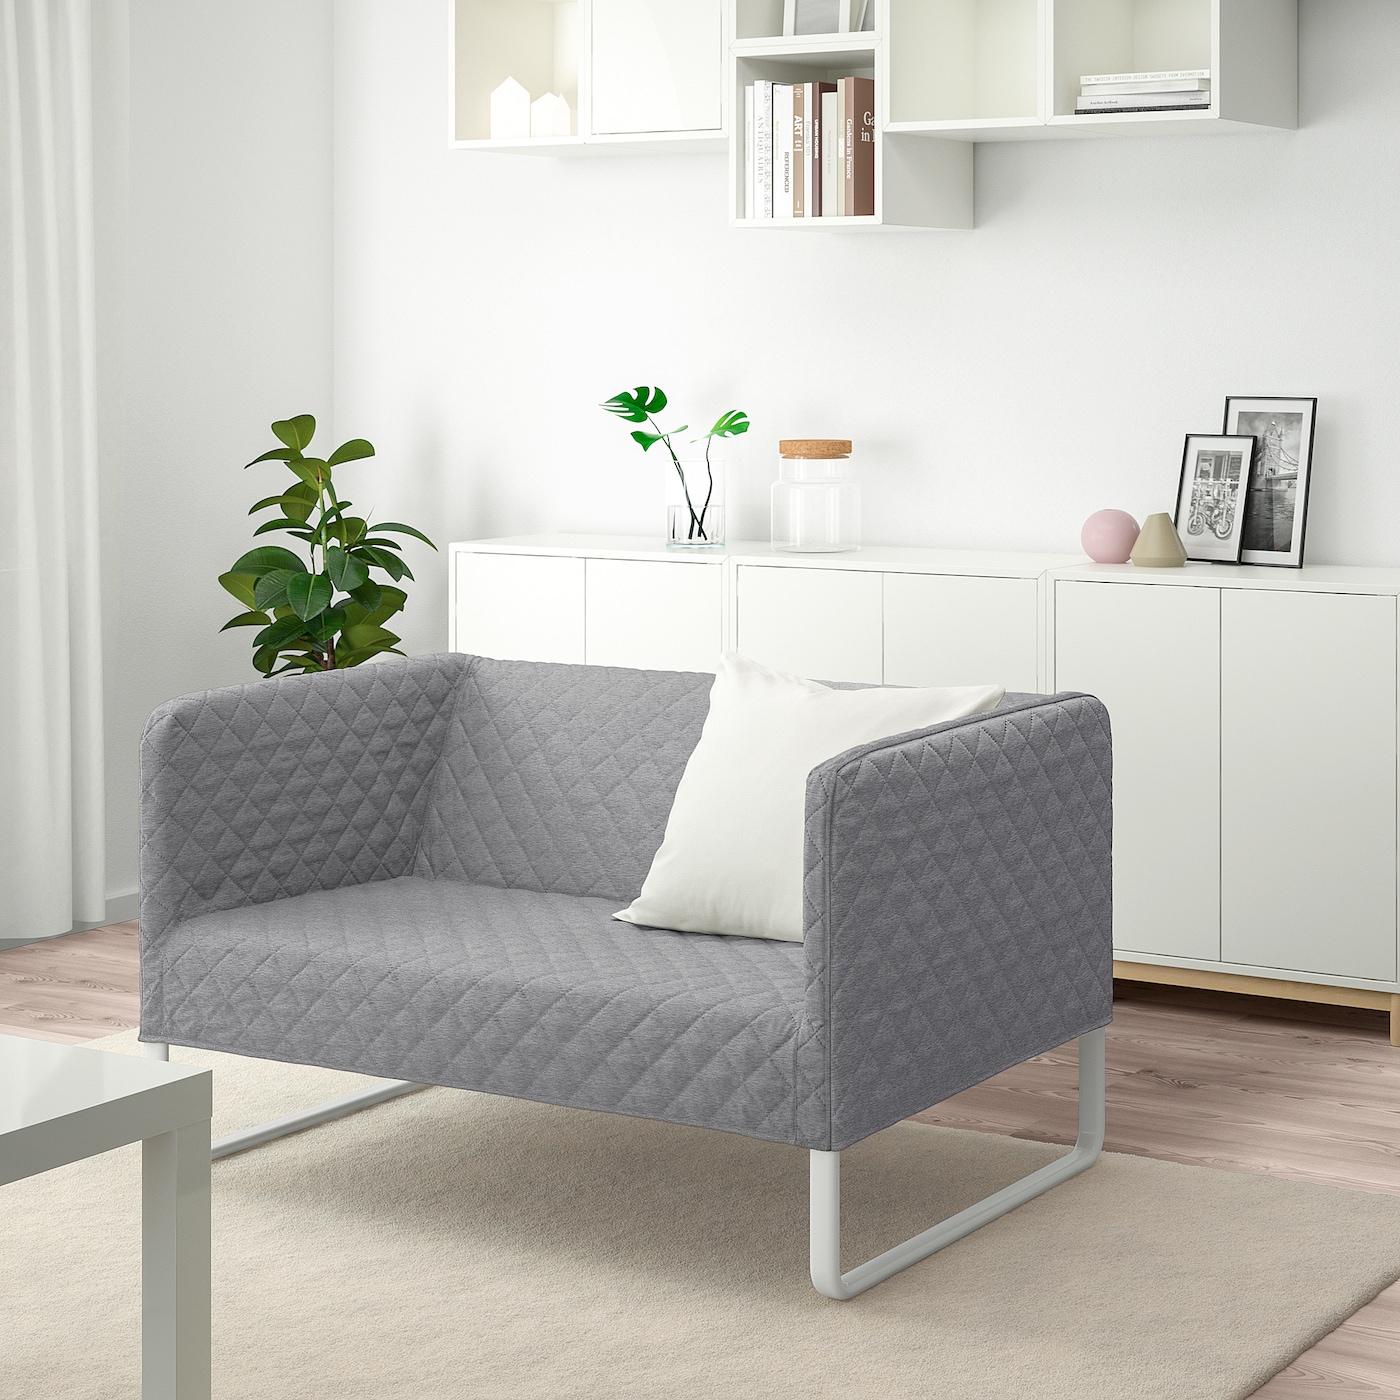 Knopparp Knisa Light Grey 2 Seat Sofa Ikea